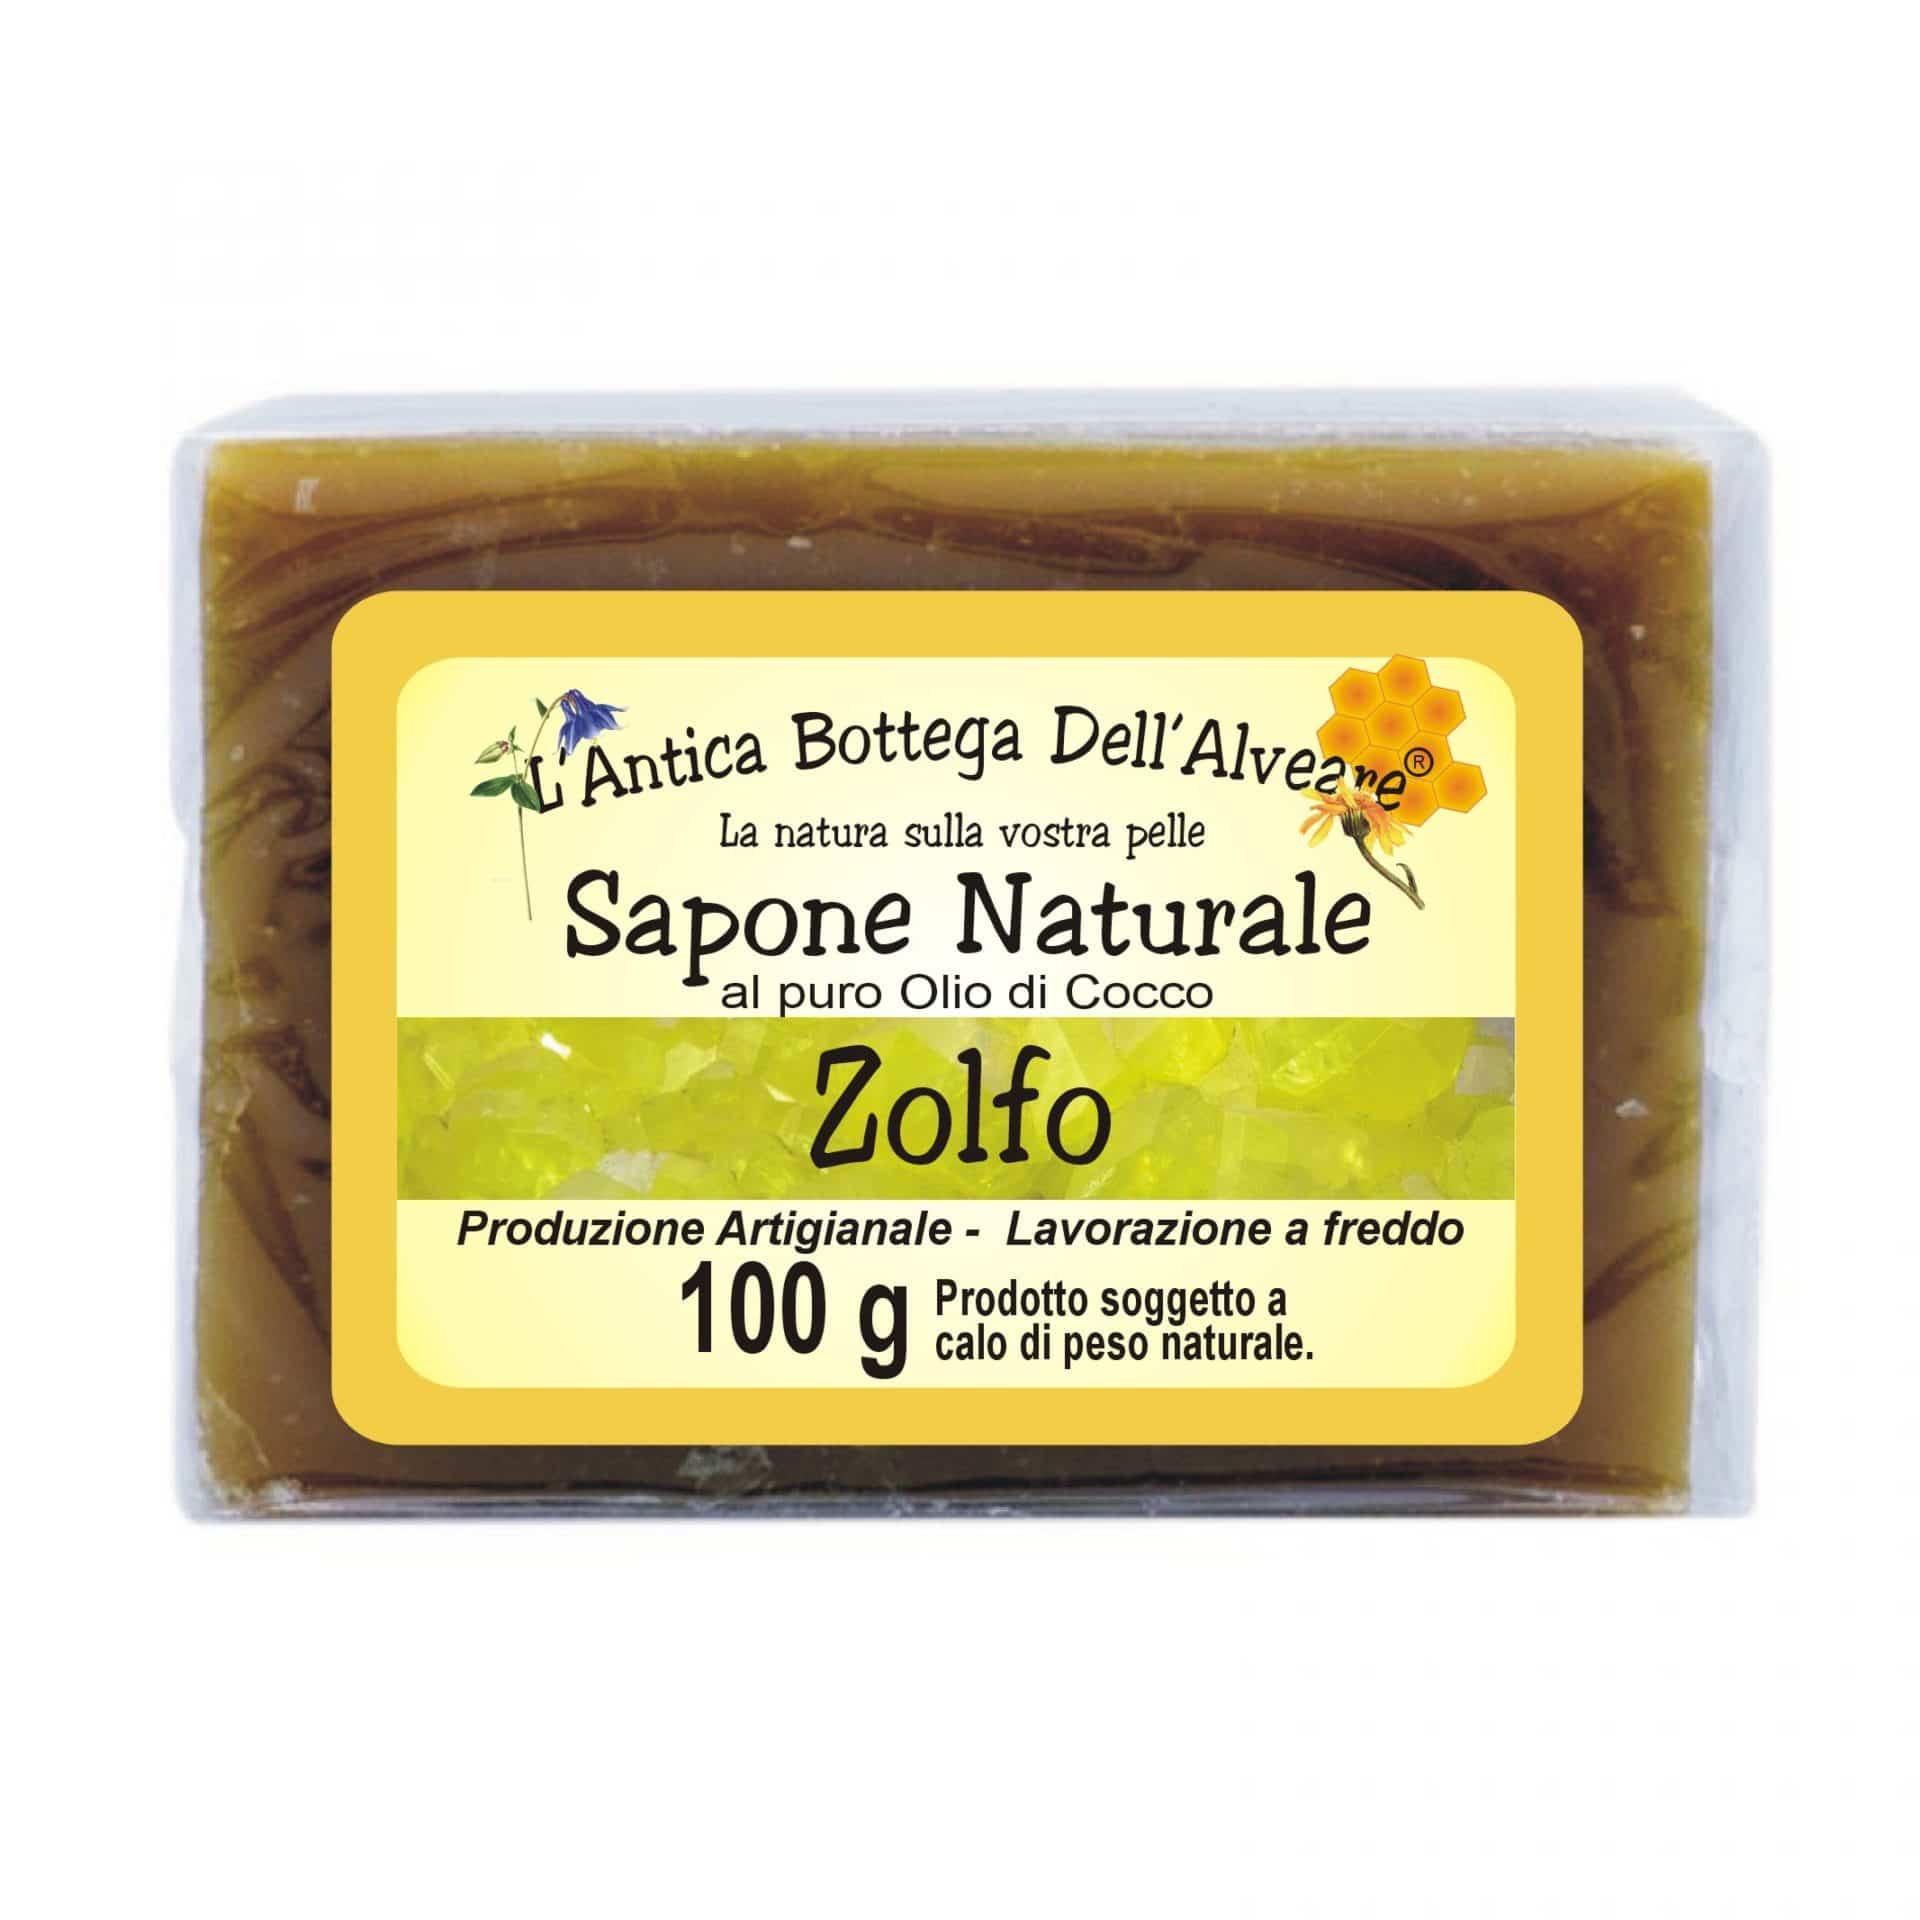 SAPONE NATURALE zolfo